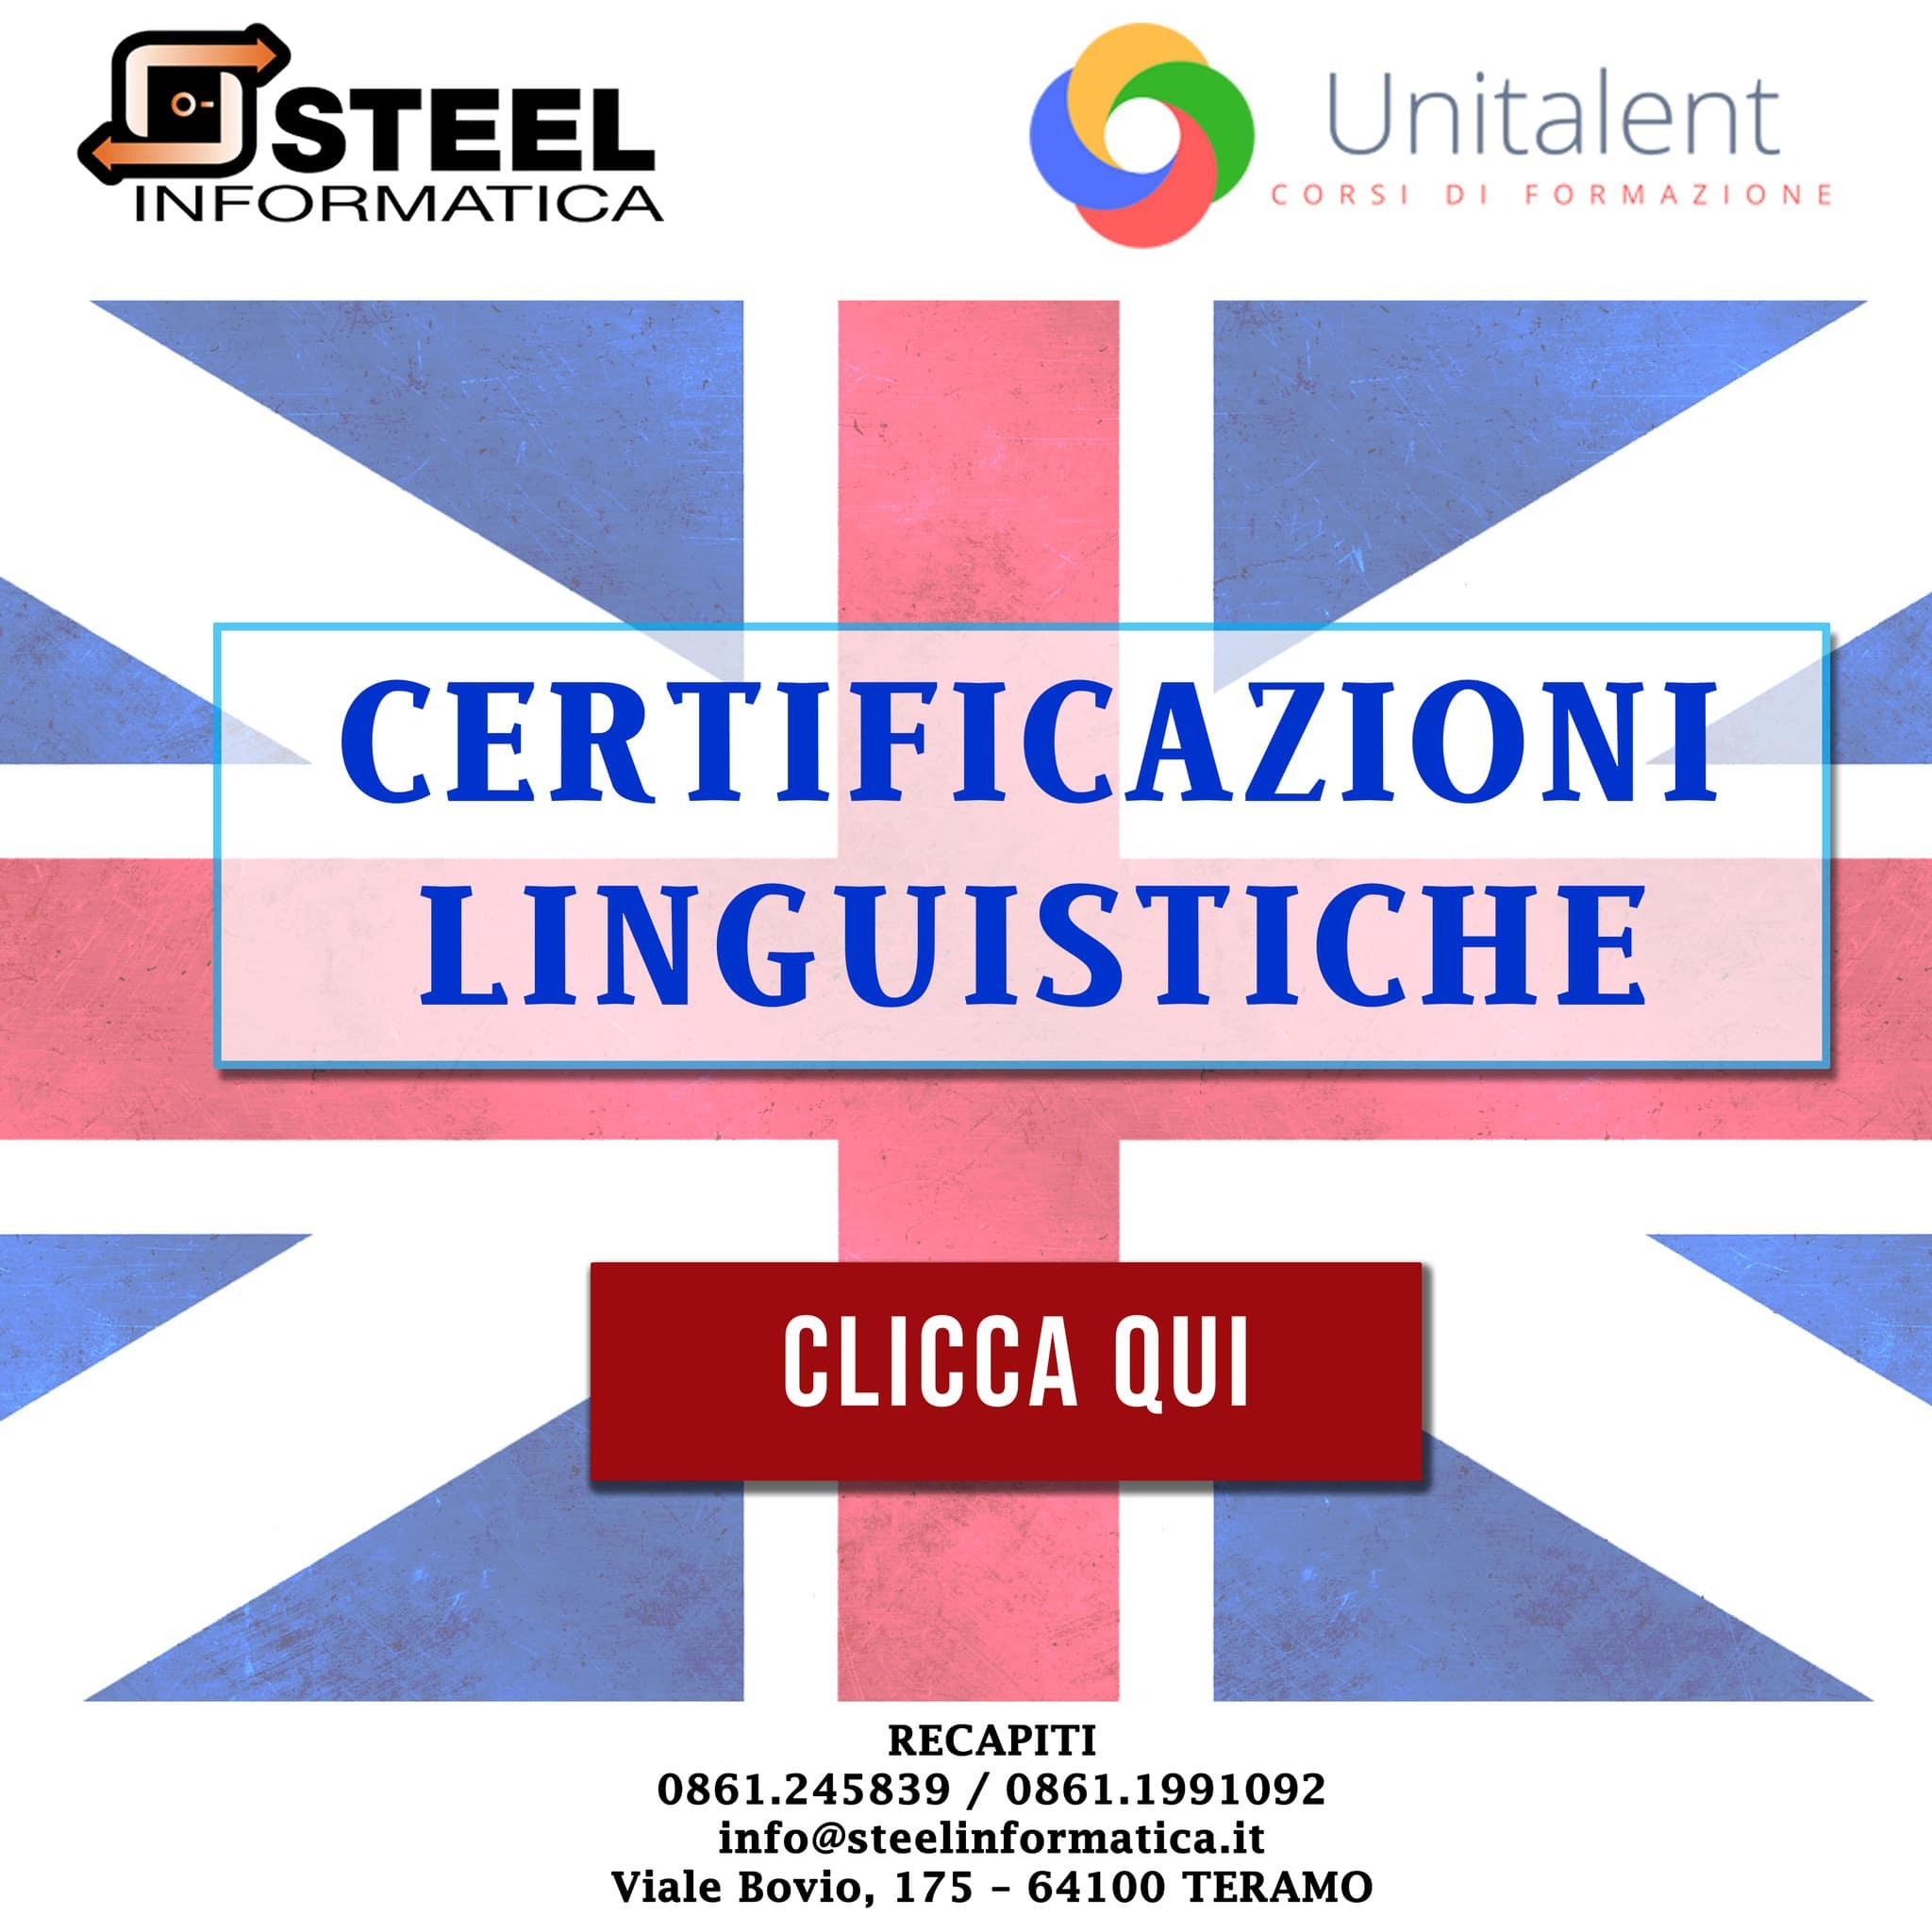 Certificazione lingua inglese fino a 6 punti!